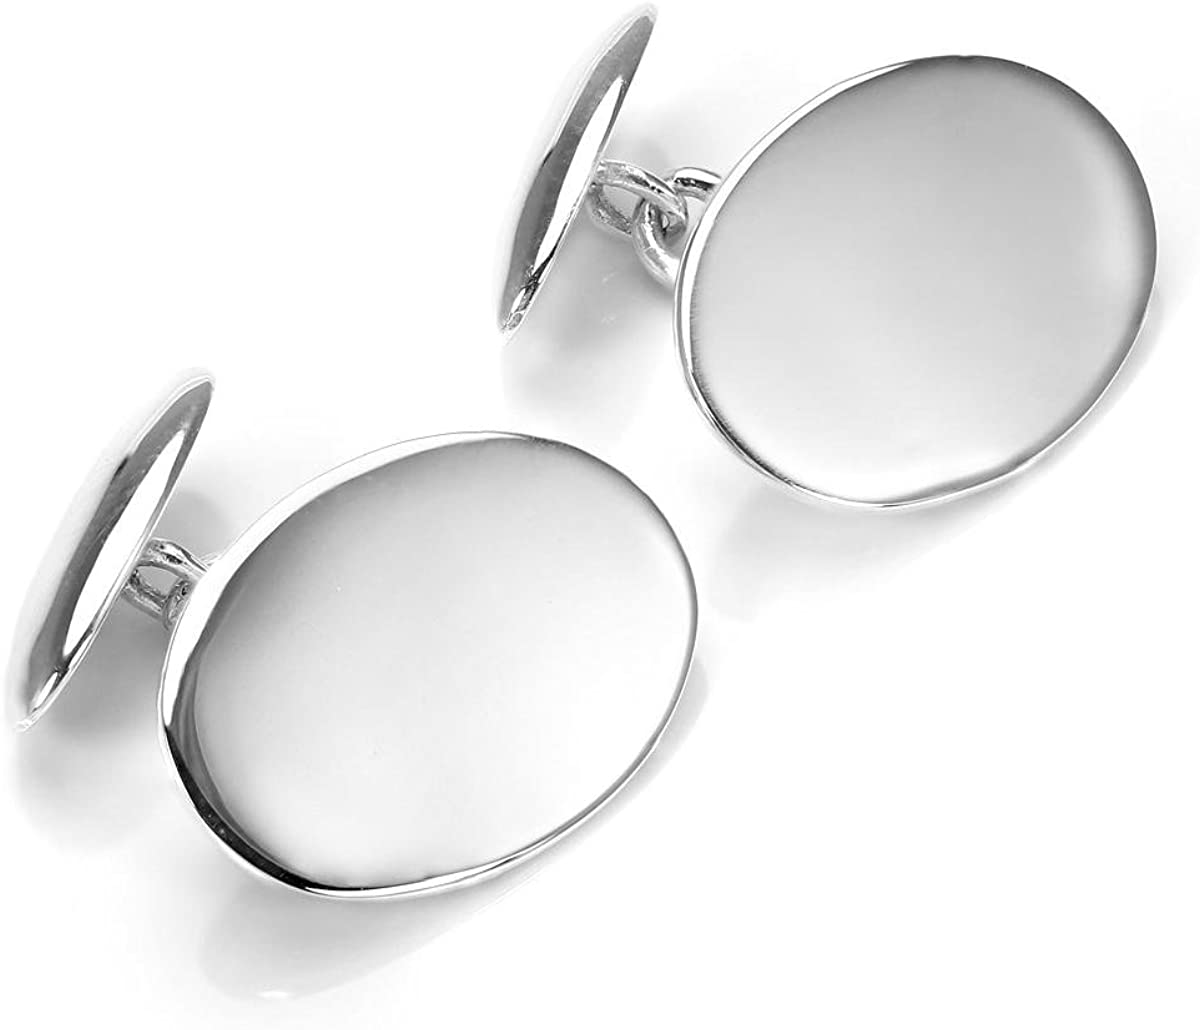 Sterling Silver Oval Chain Cufflinks